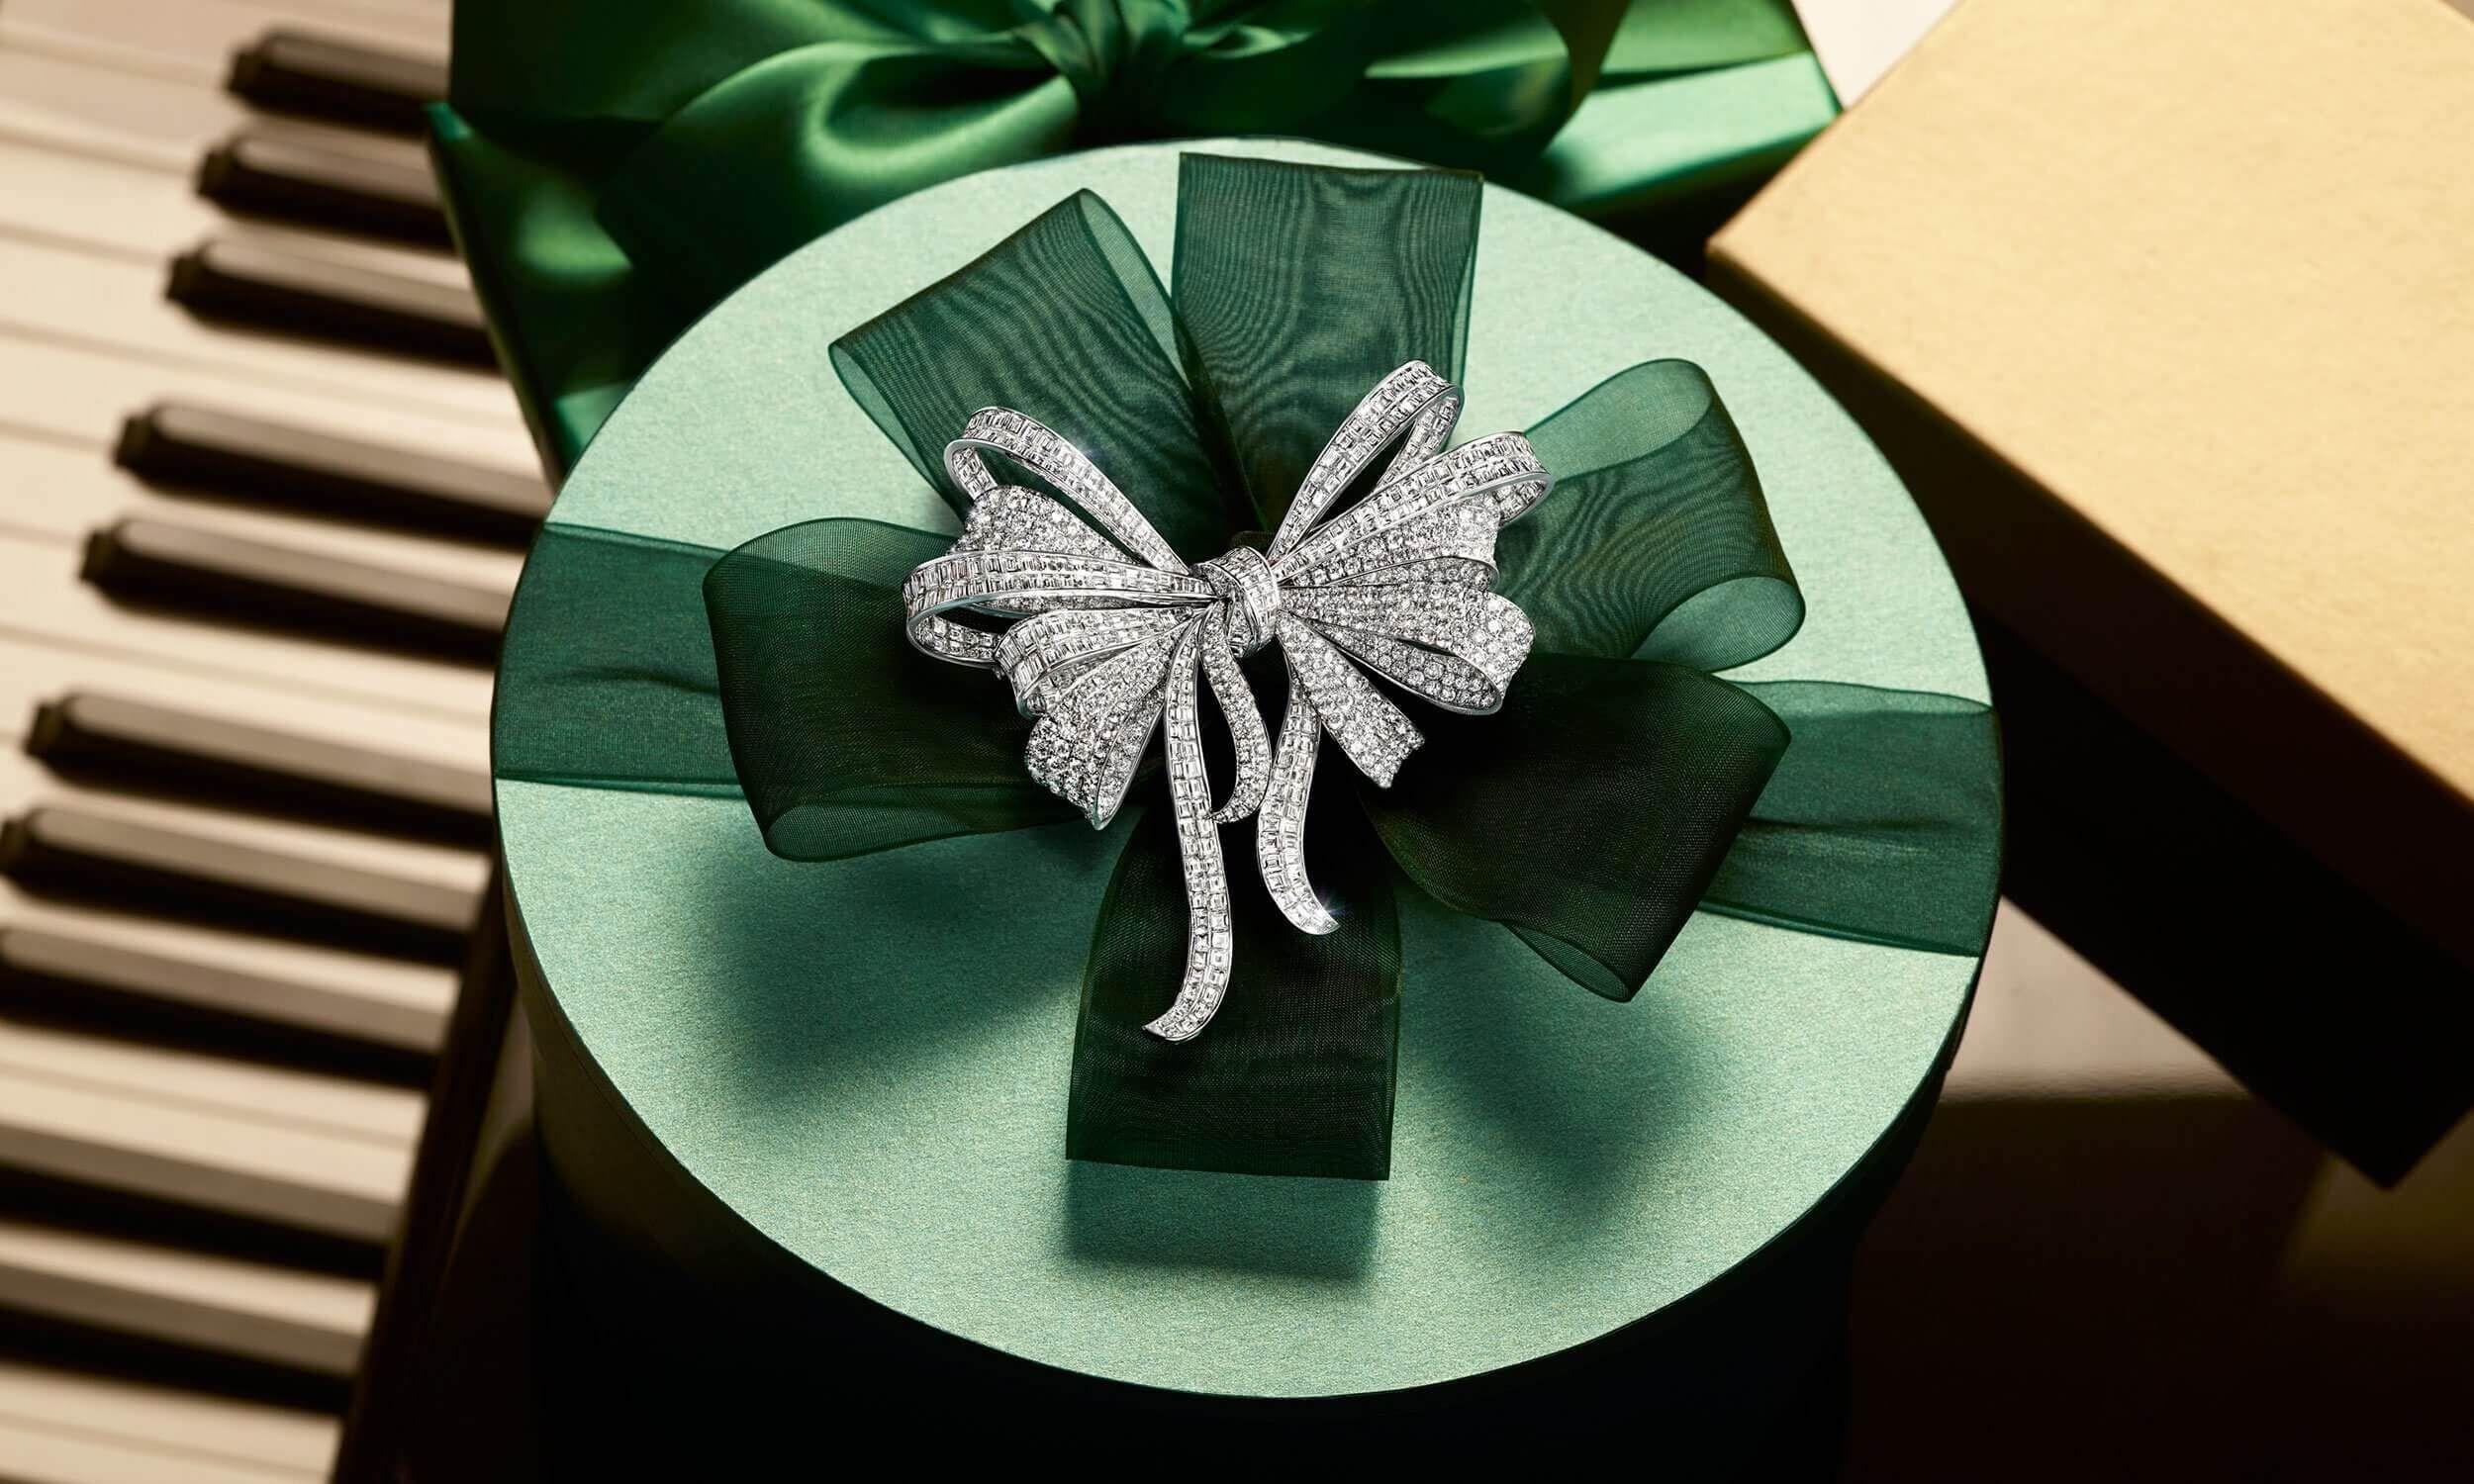 A Graff Diamond Bow Brooch on a holiday season Christmas green gift box